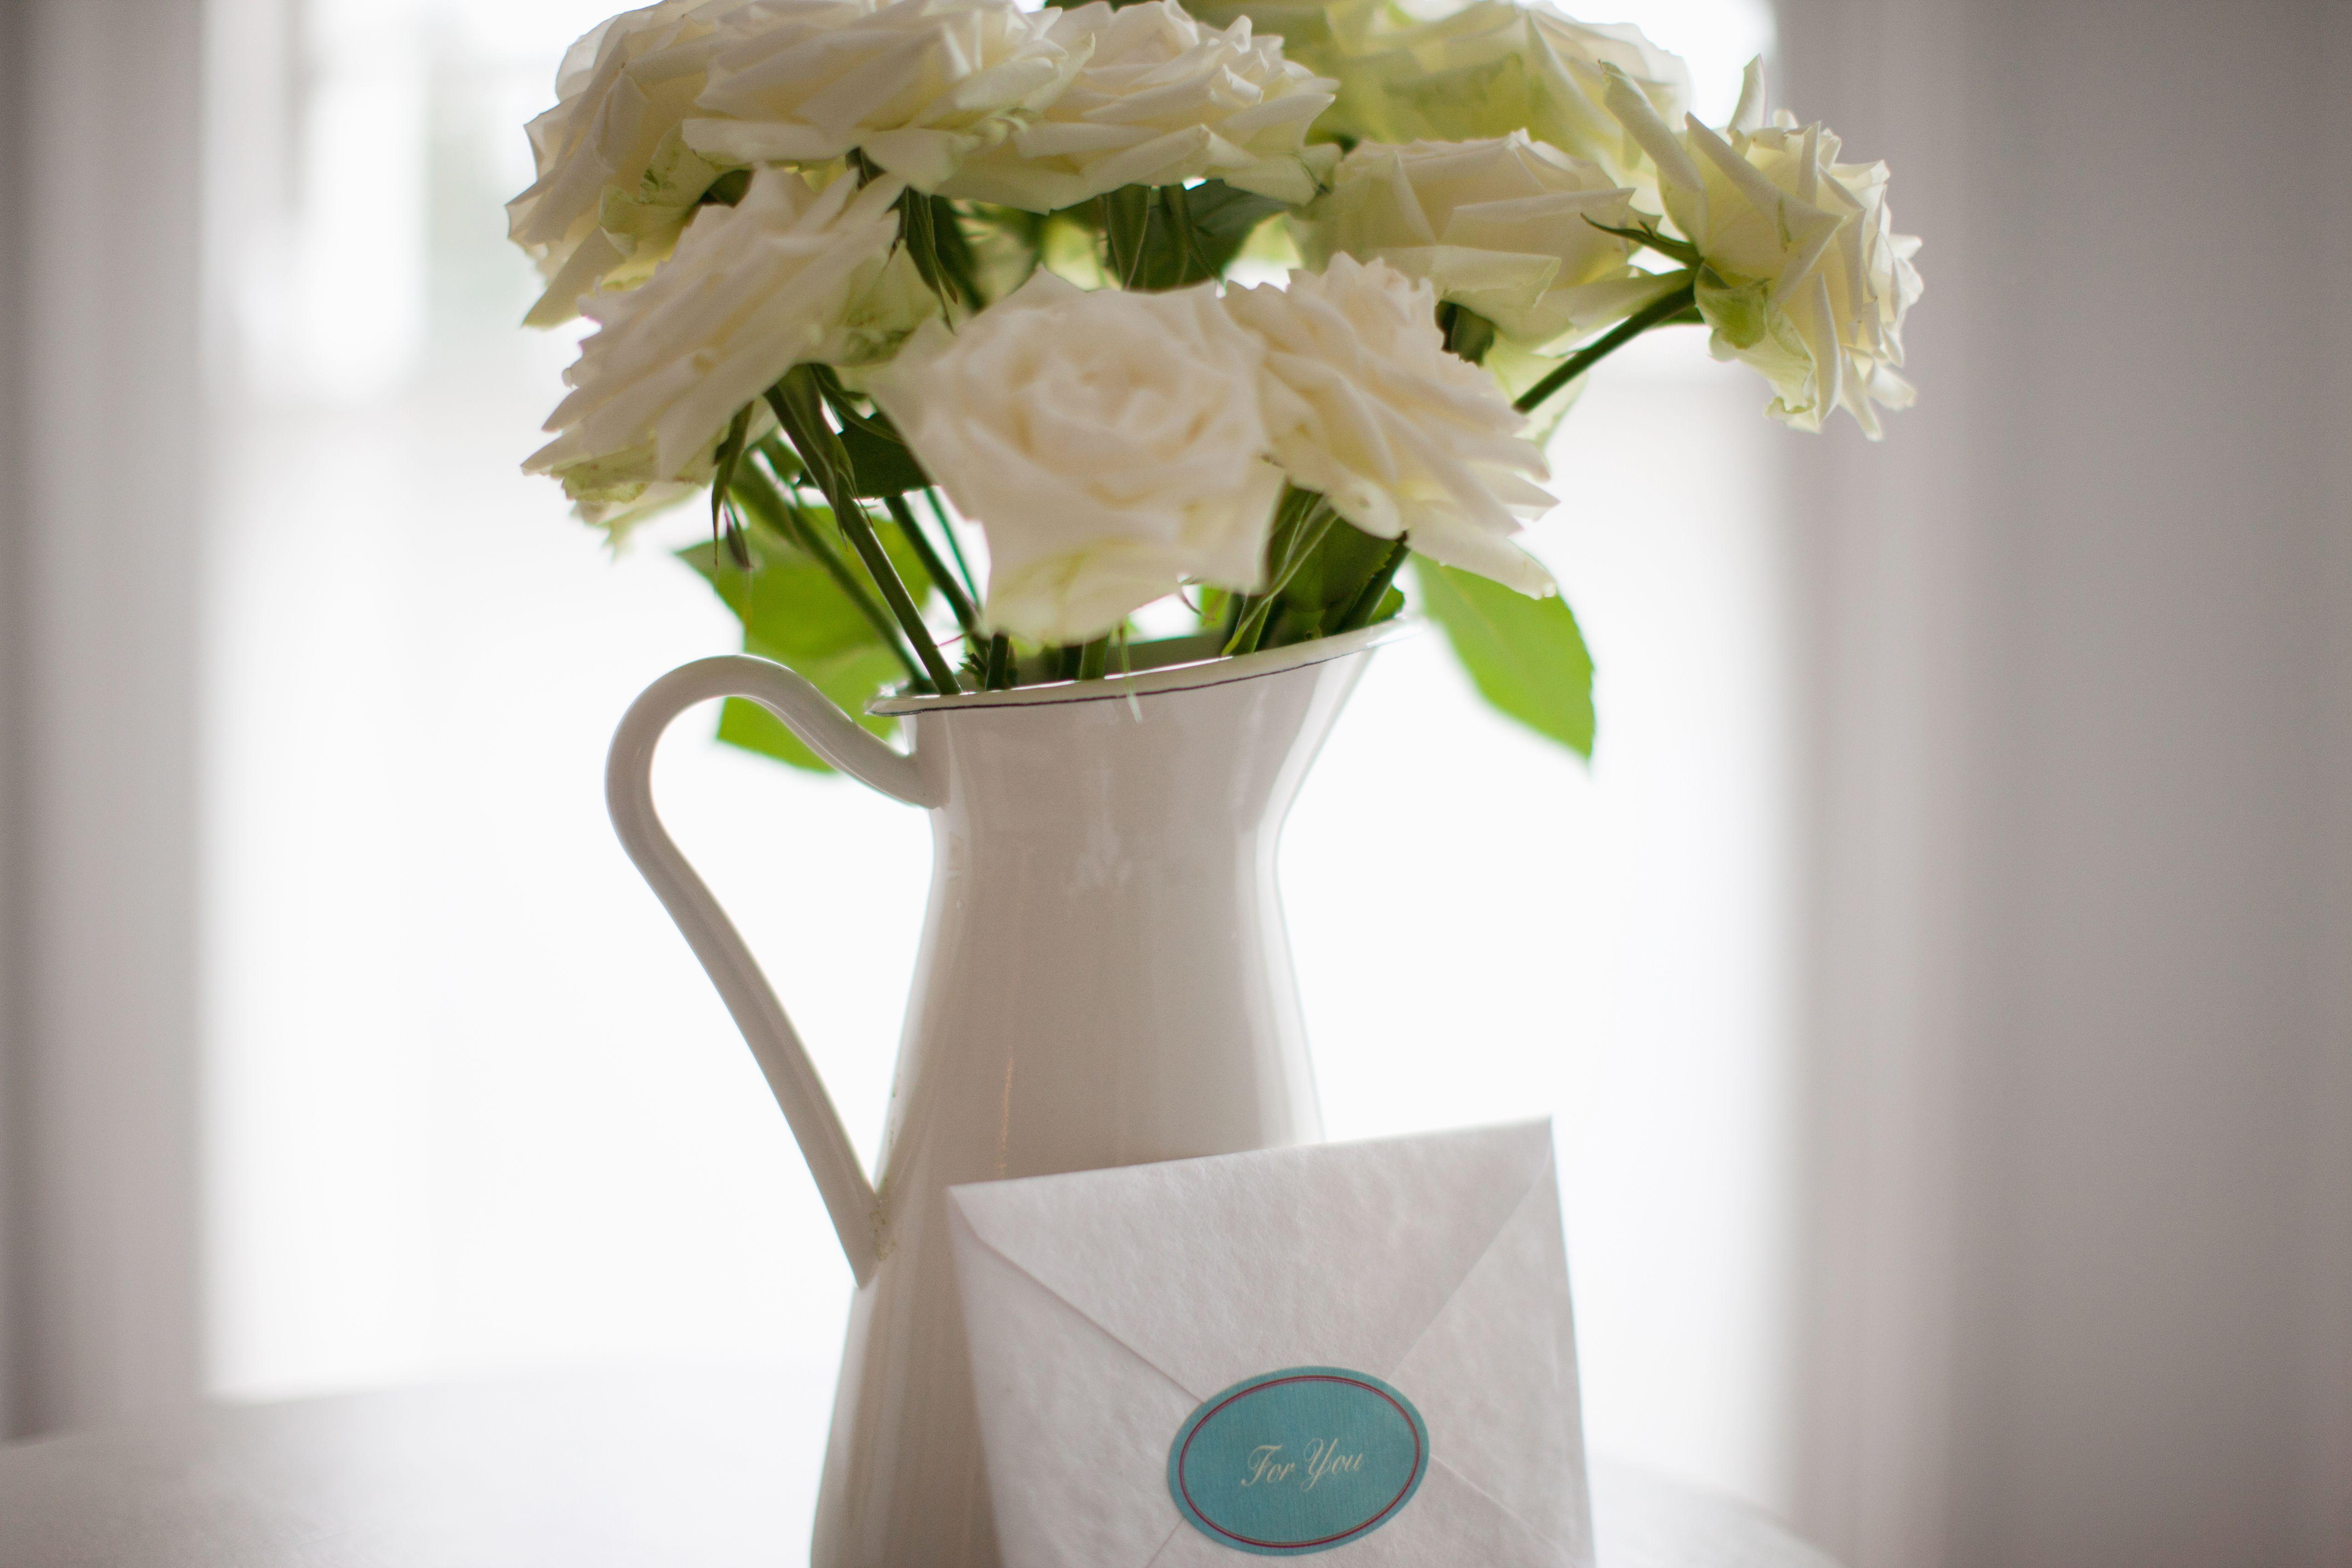 11 Free, Printable Condolence And Sympathy Cards - Free Printable Sympathy Cards For Loss Of Dog